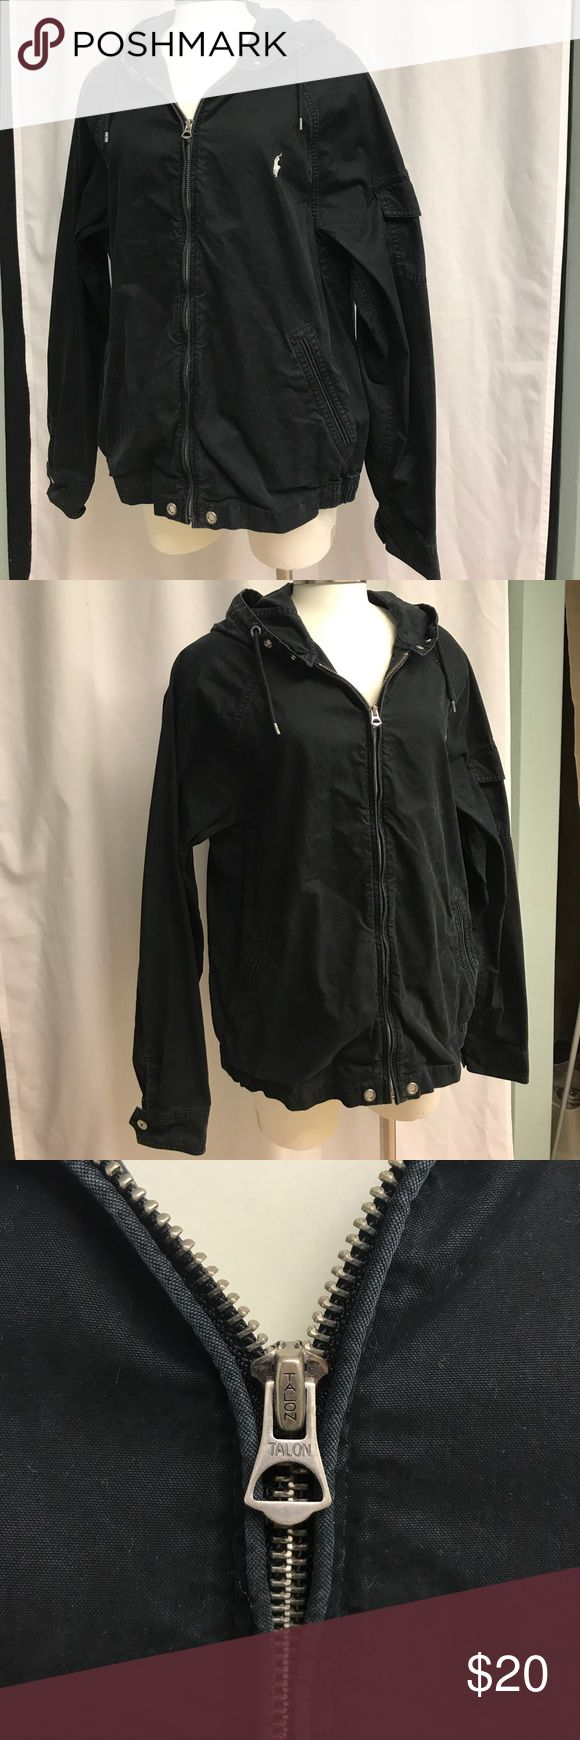 POLO Ralph Lauren Vintage Look Jacket Black Vintage Look Polo Jacket. Size medium. Unisex. Smoke free home! Polo by Ralph Lauren Jackets & Coats Utility Jackets